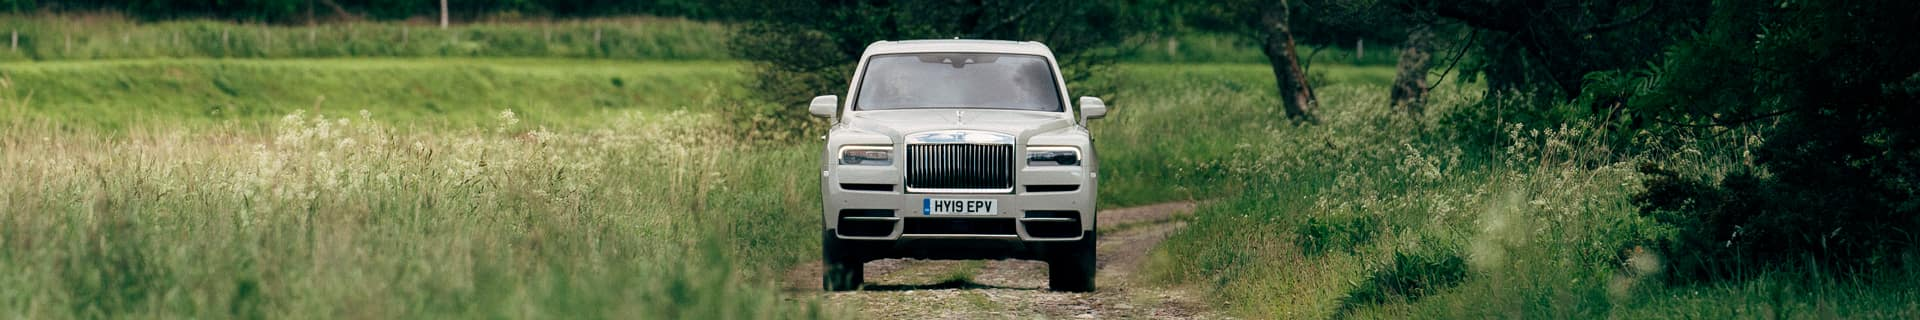 Rolls-Royce Motor Cars Cullinan SUV in Charleston SC